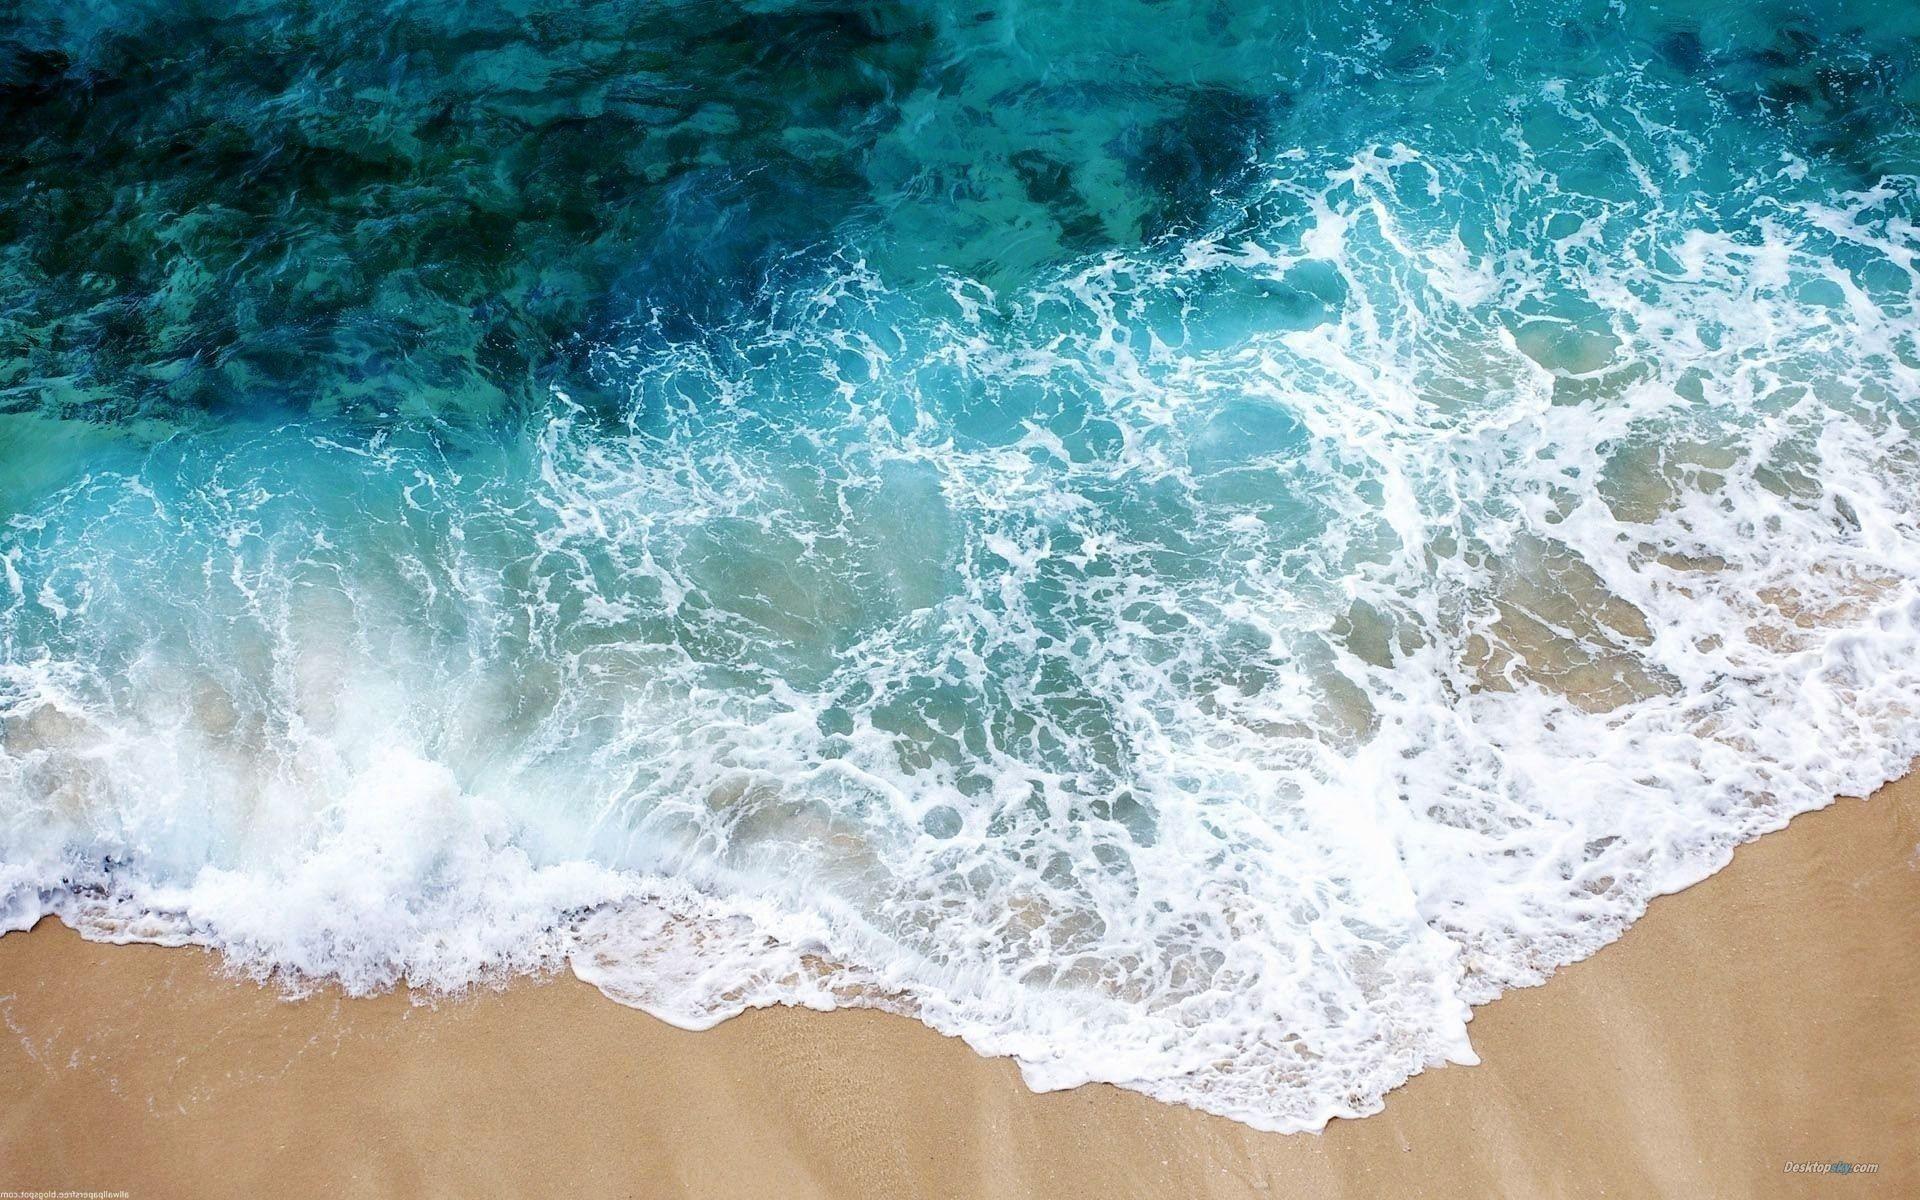 The 25 Best Lenovo Wallpapers Ideas On Pinterest: Summer Desktop Backgrounds (72+ Pictures